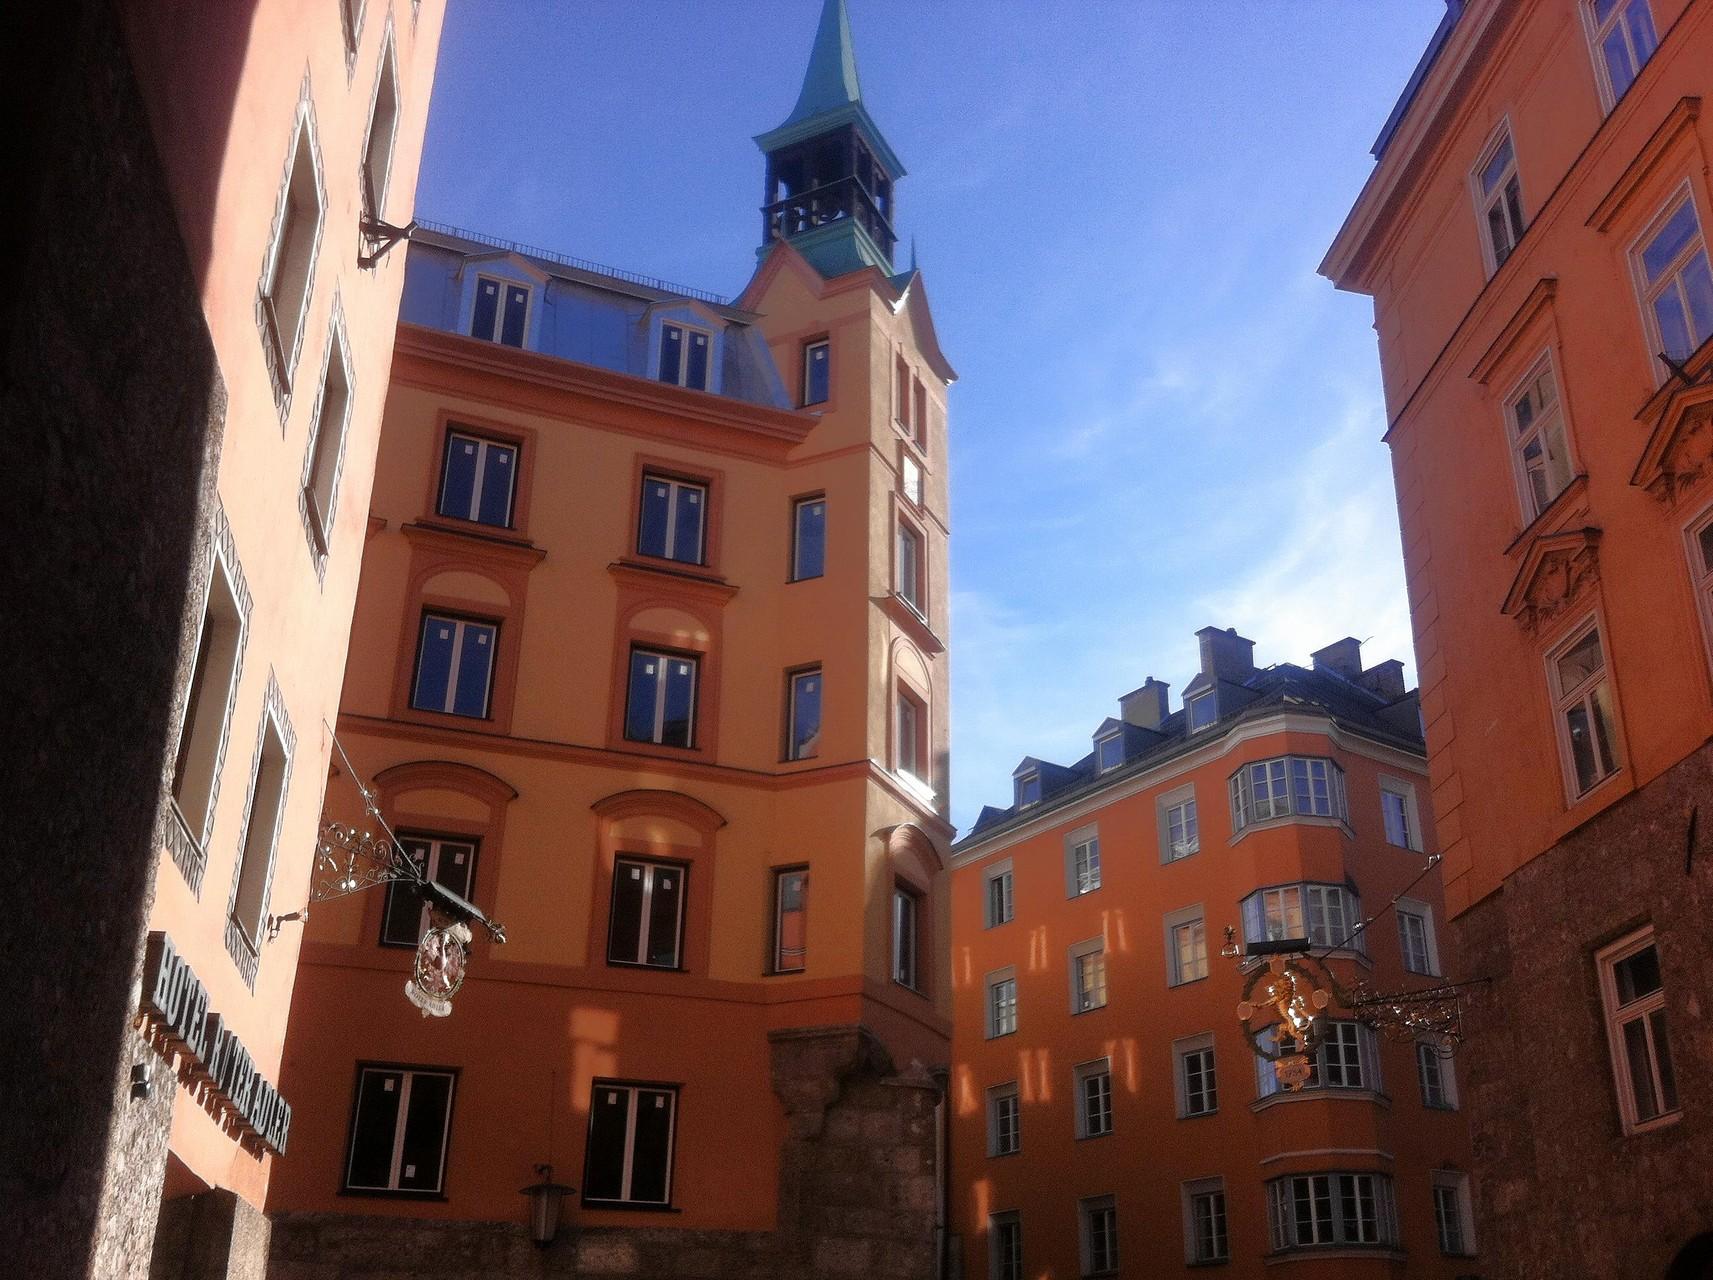 in der Innsbrucker Altstadt - 20.Feber 2015